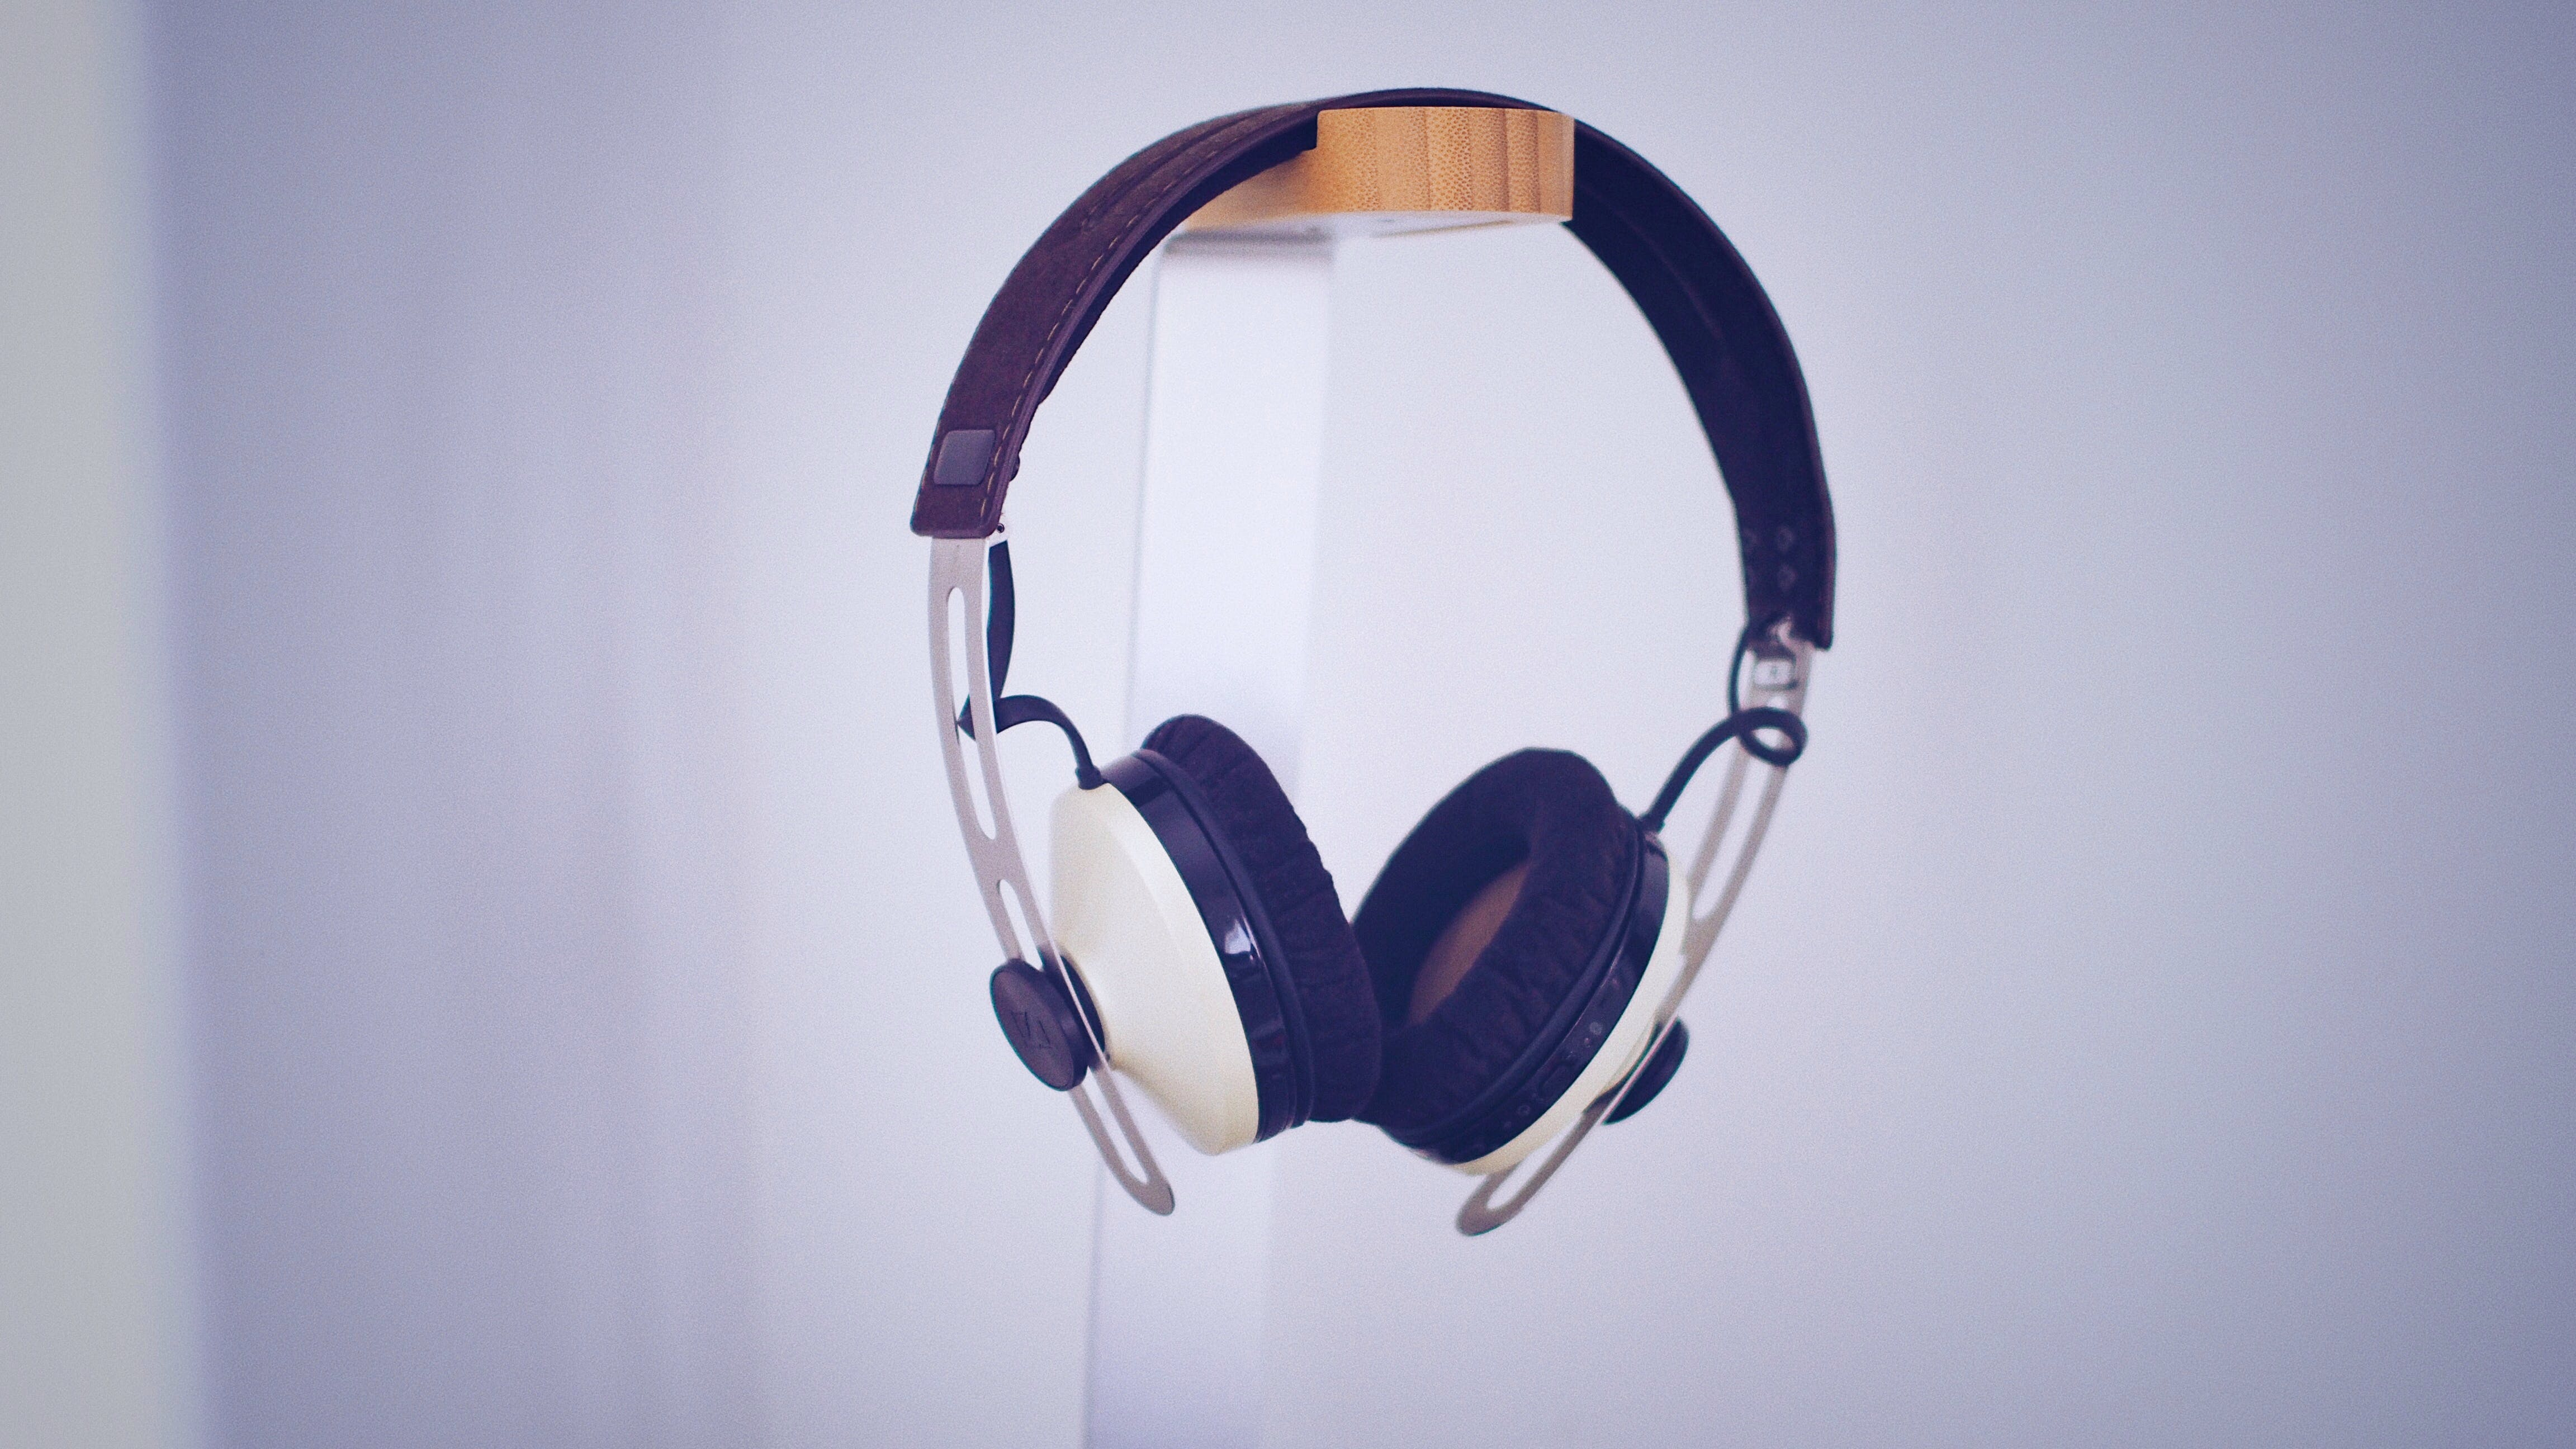 Black and White Wireless Headphones